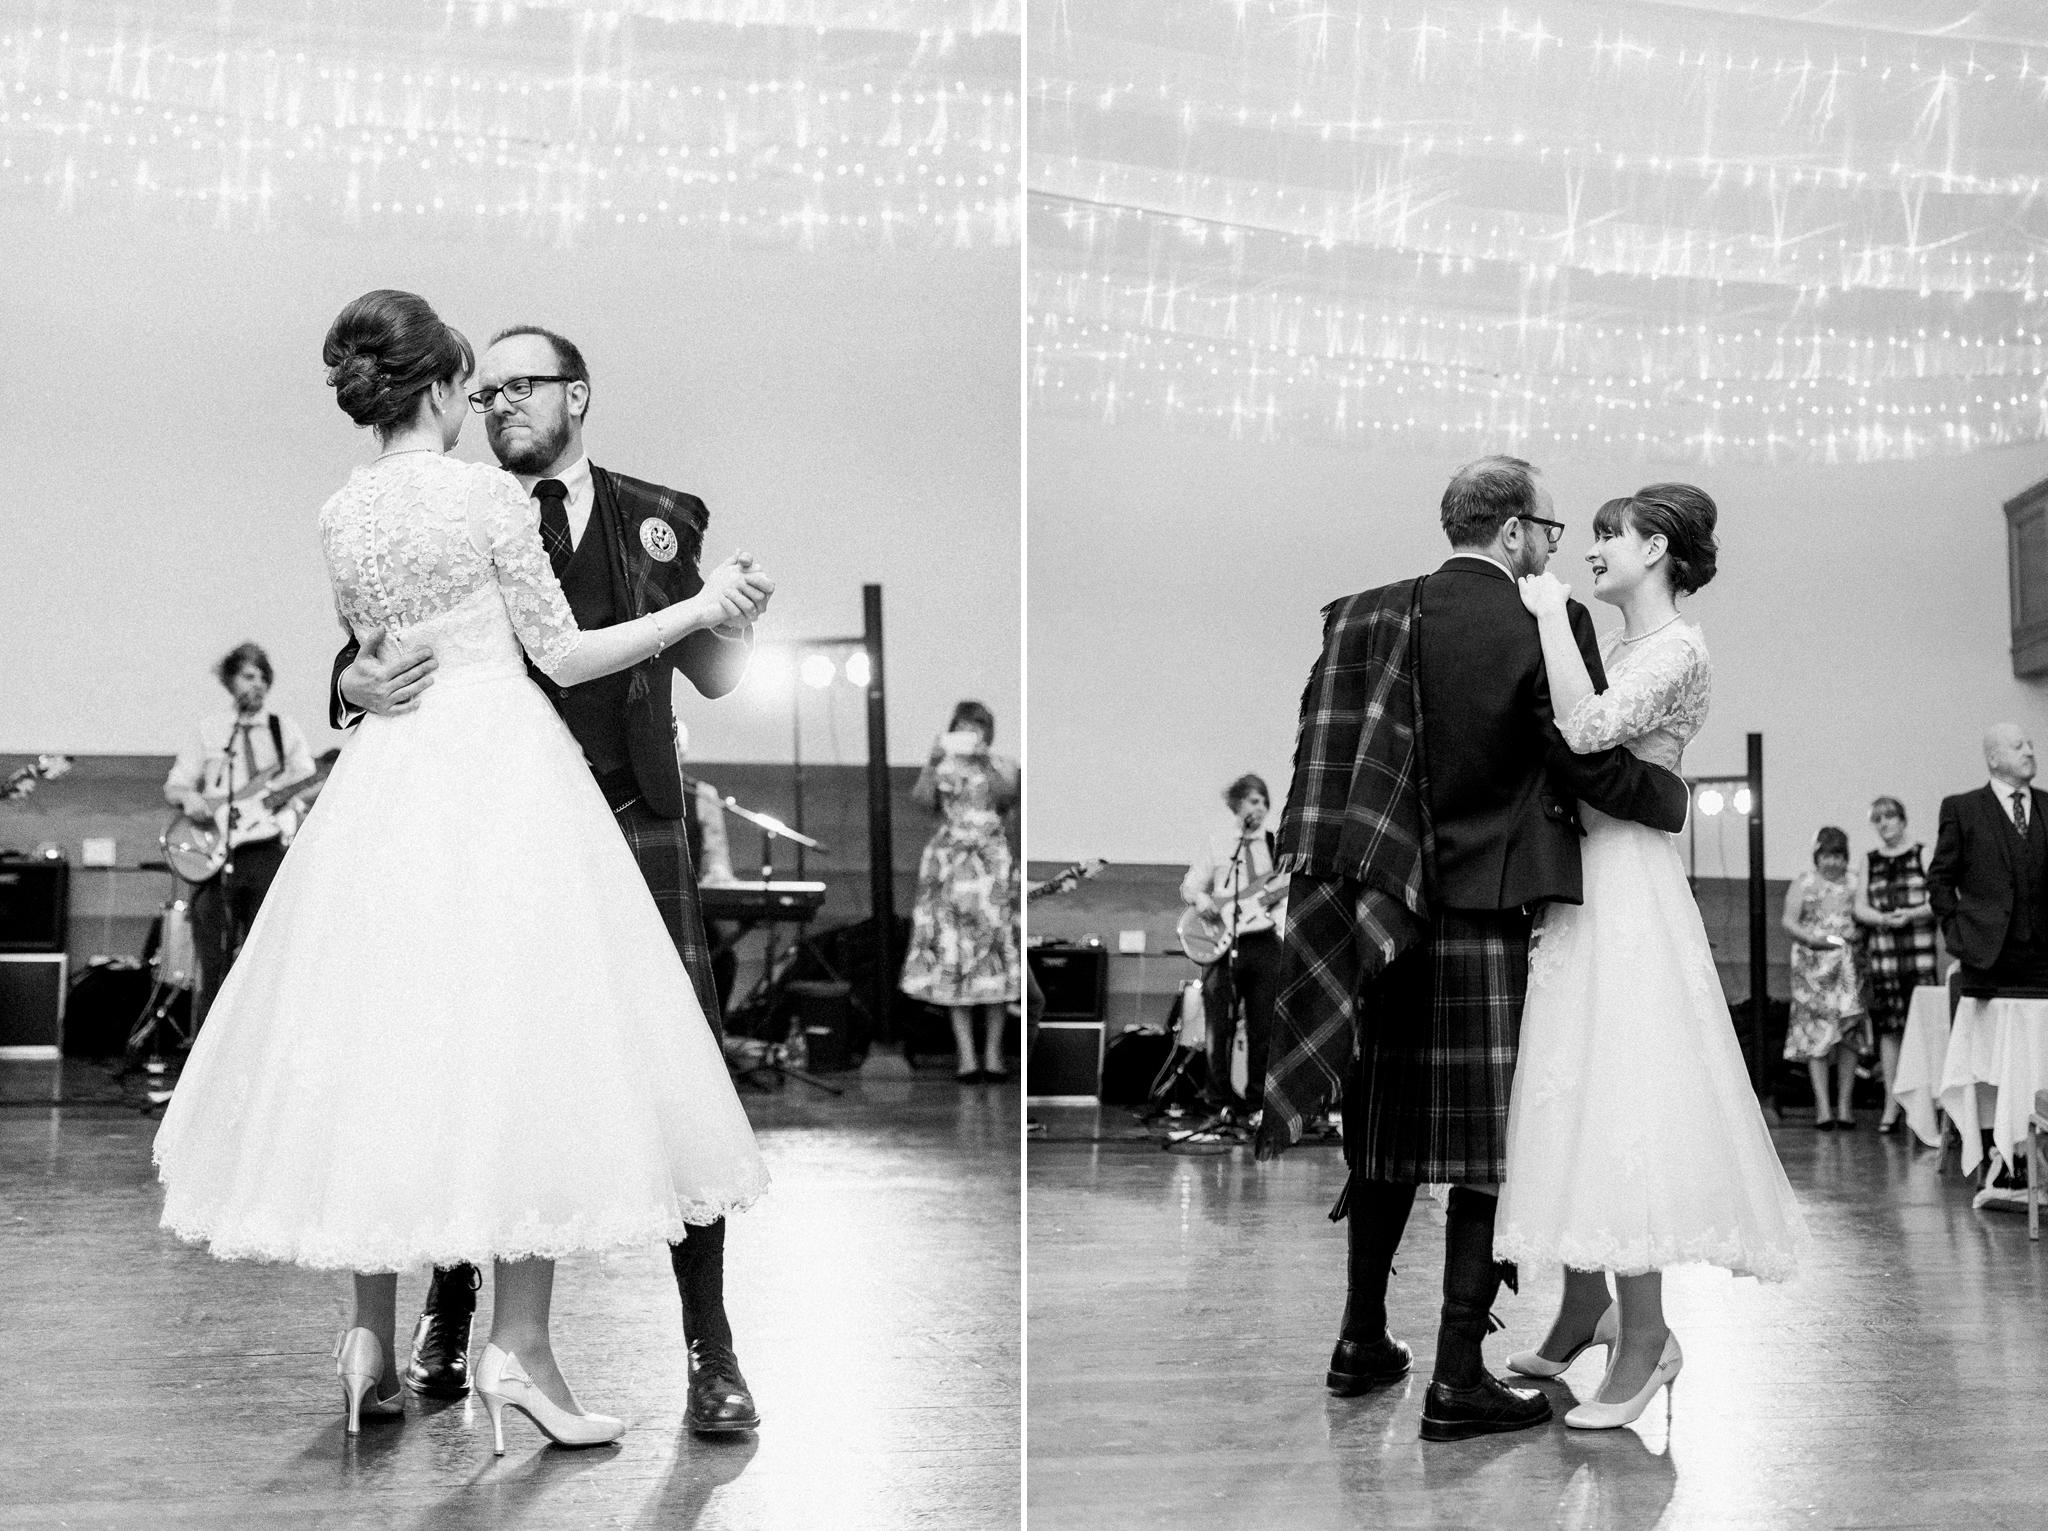 111-desination-wedding-photographer-scotland.jpg